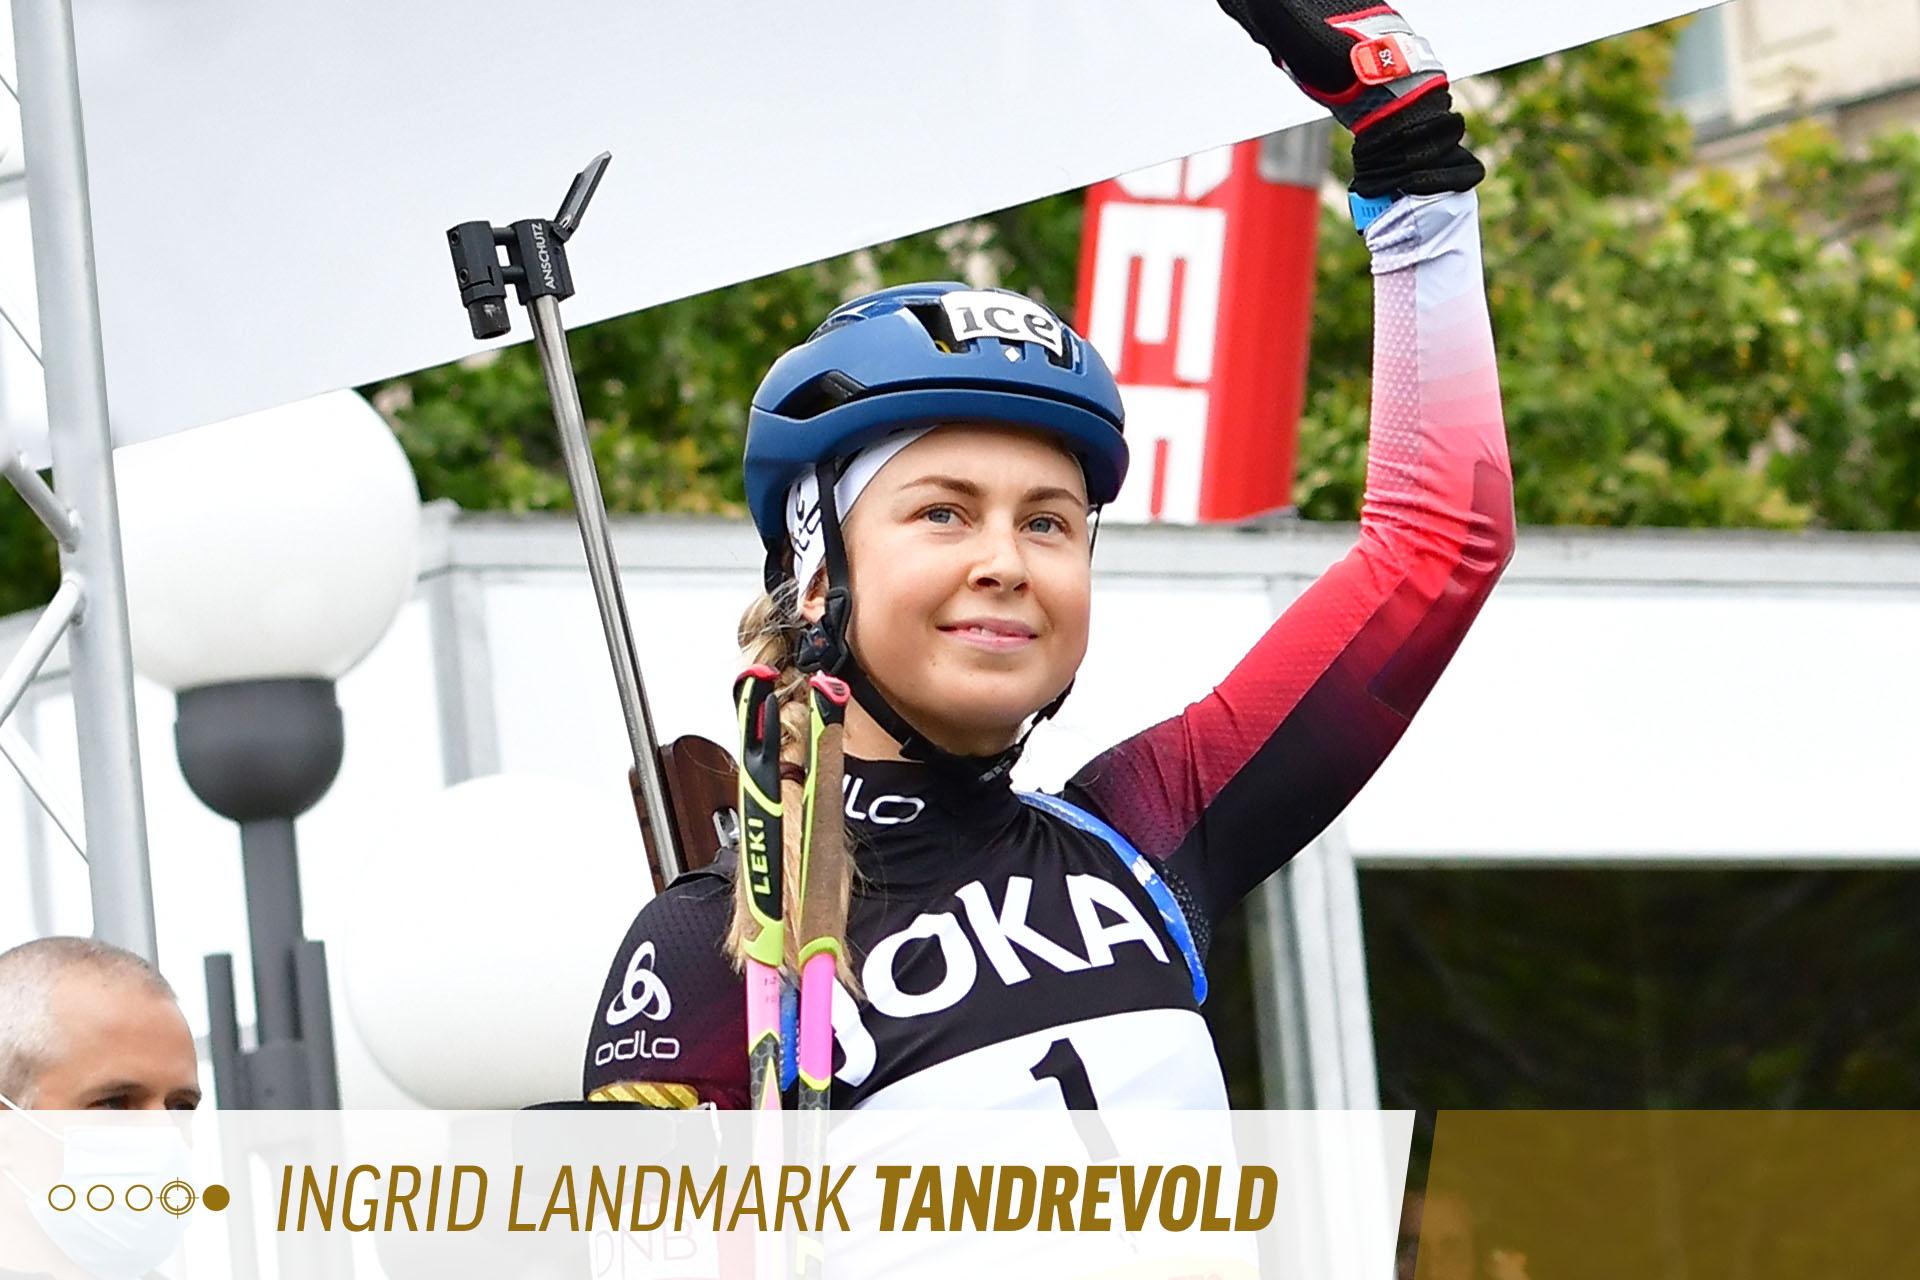 Athleten_IngridLandmarkTandrevold